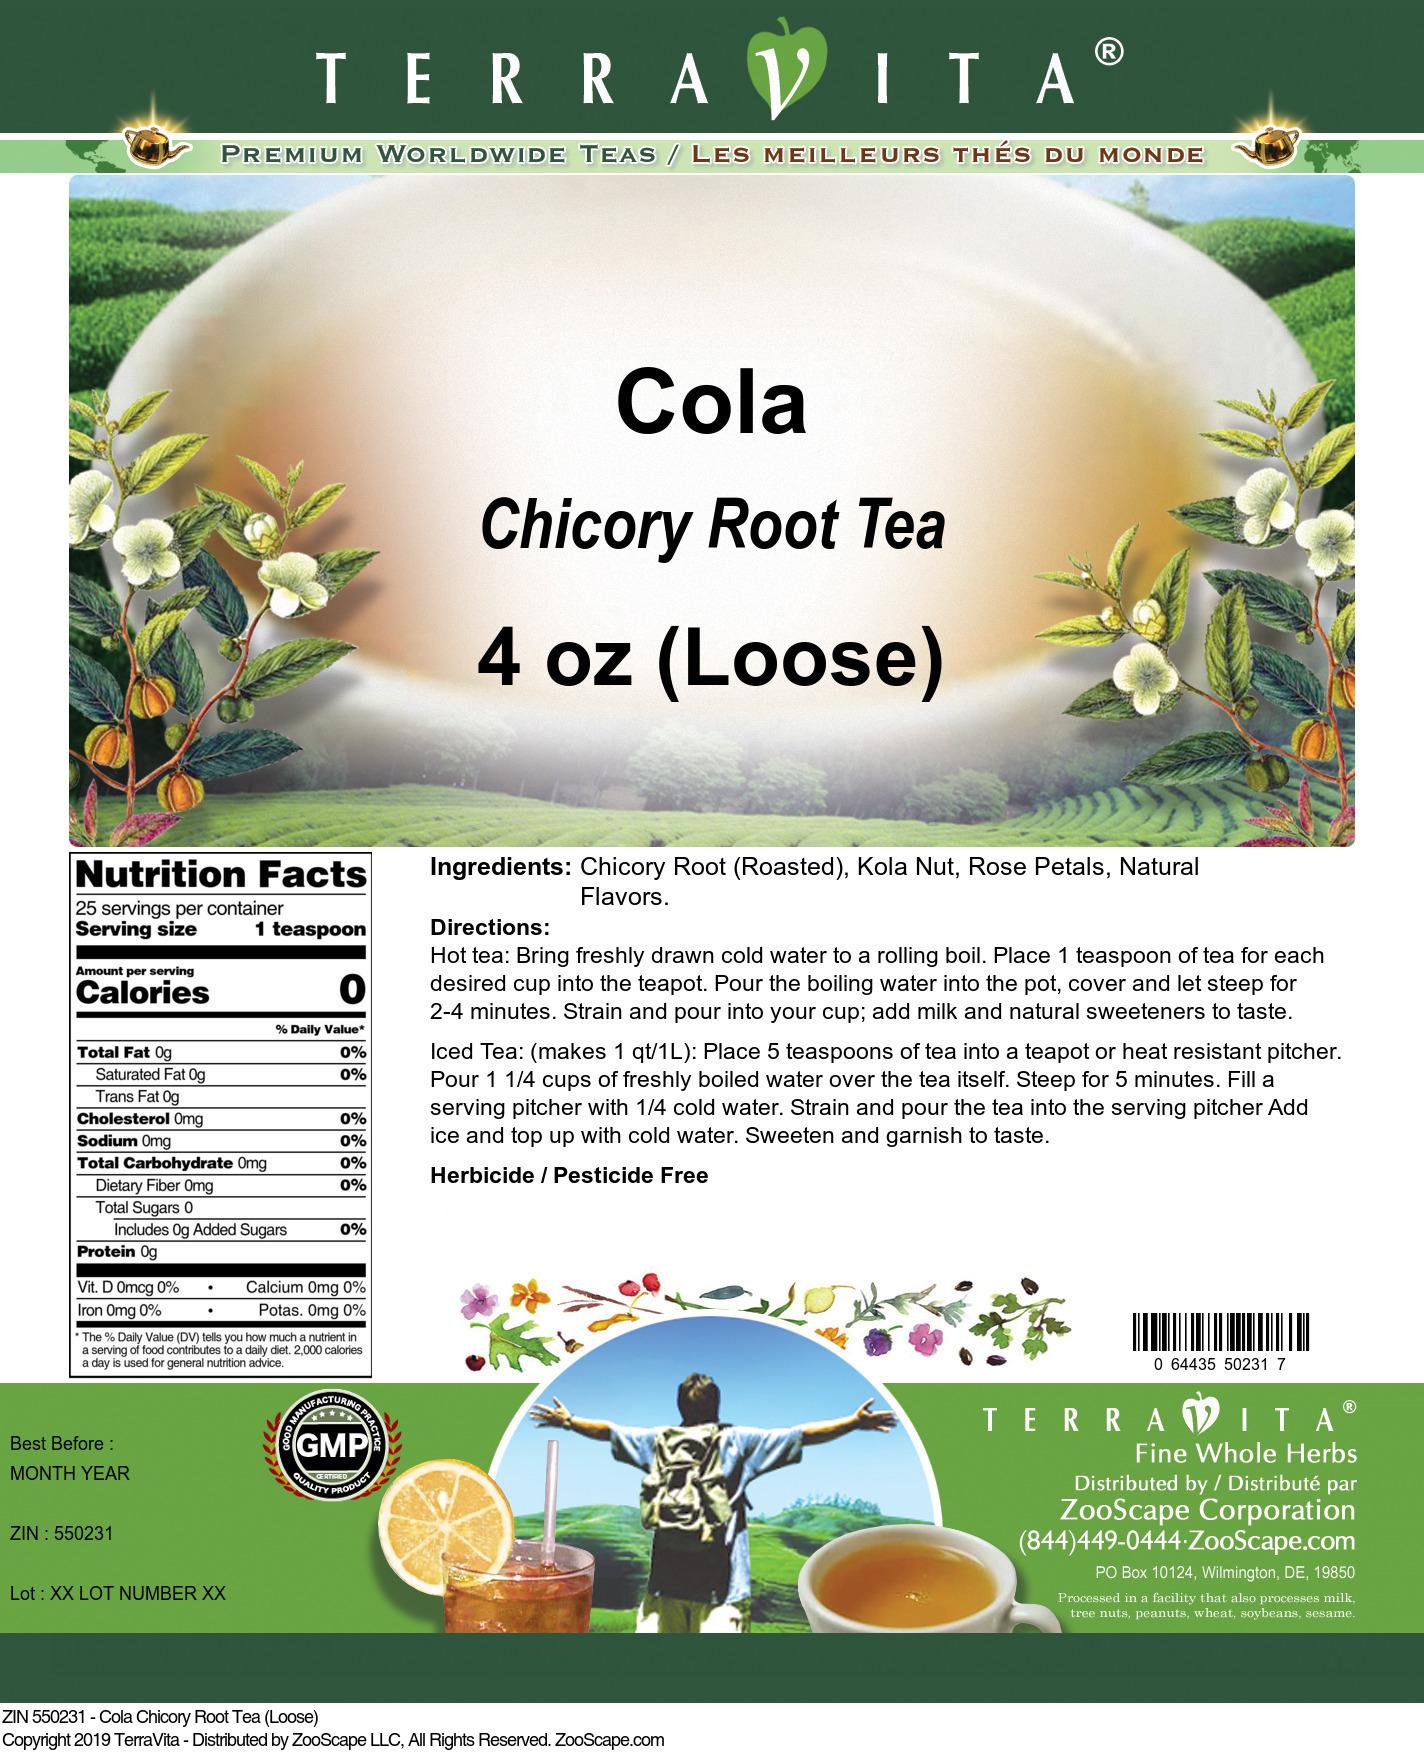 Cola Chicory Root Tea (Loose)